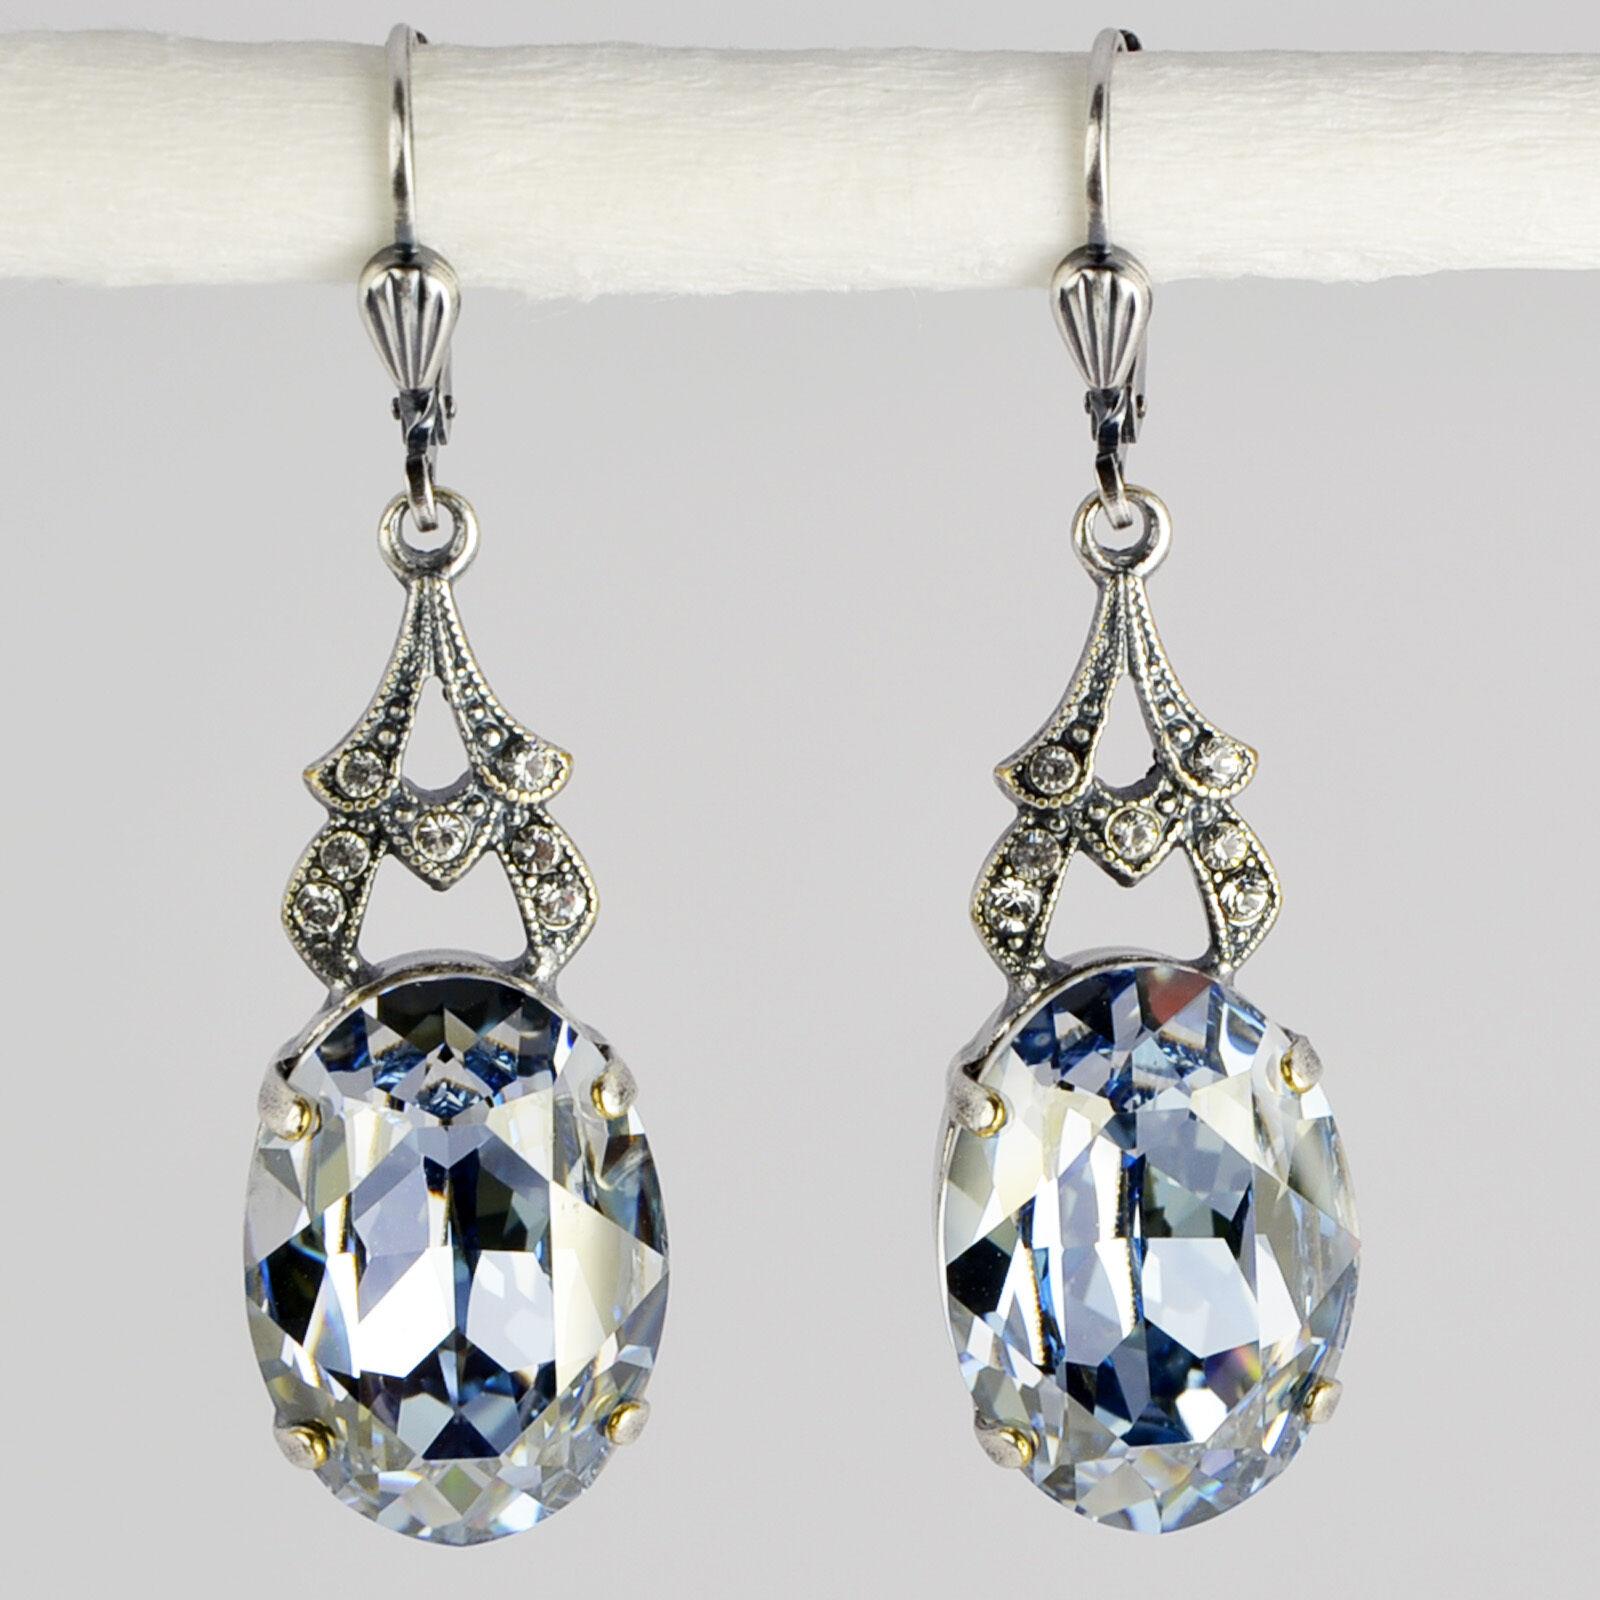 Grevenkämper Ohrringe Swarovski Kristall silver Oval Vintage blue bluee Shade